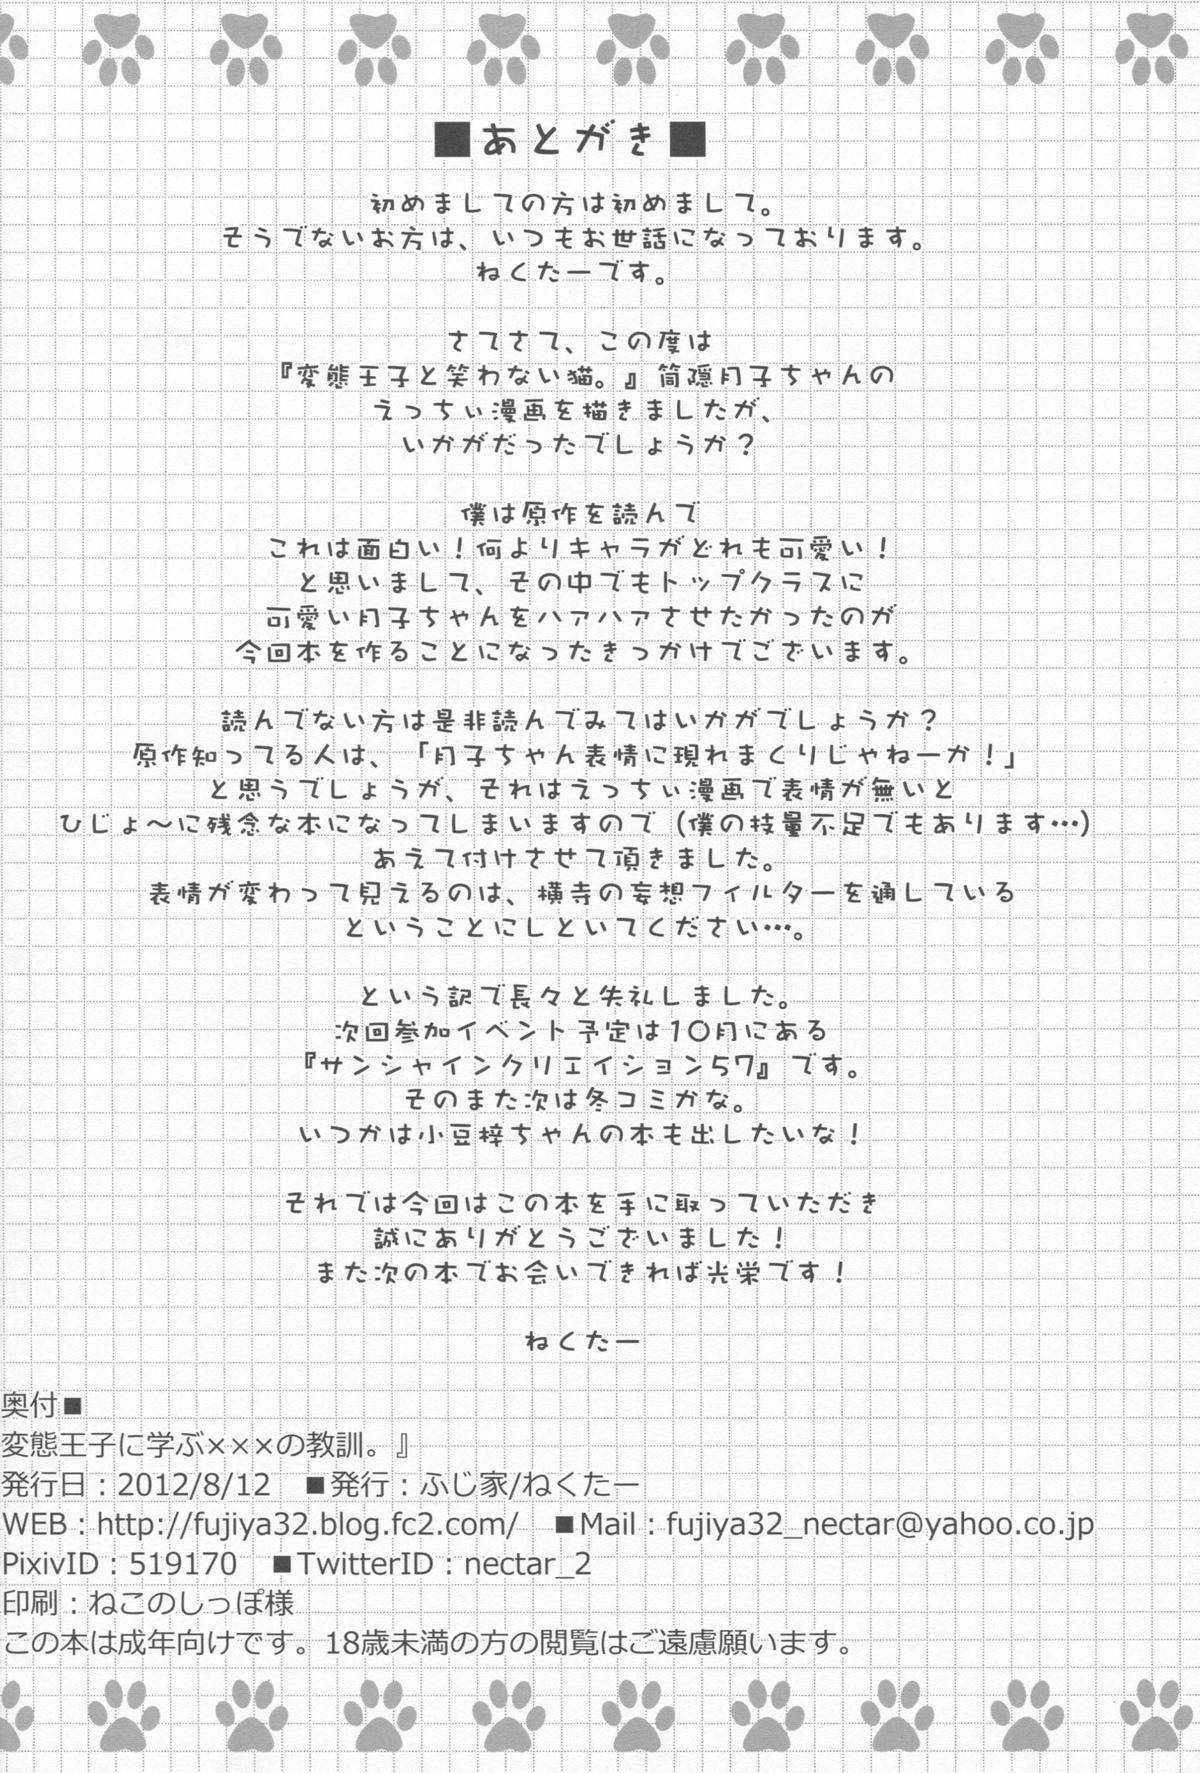 Hentai Ouji ni Manabu ××× no Kyoukun 22